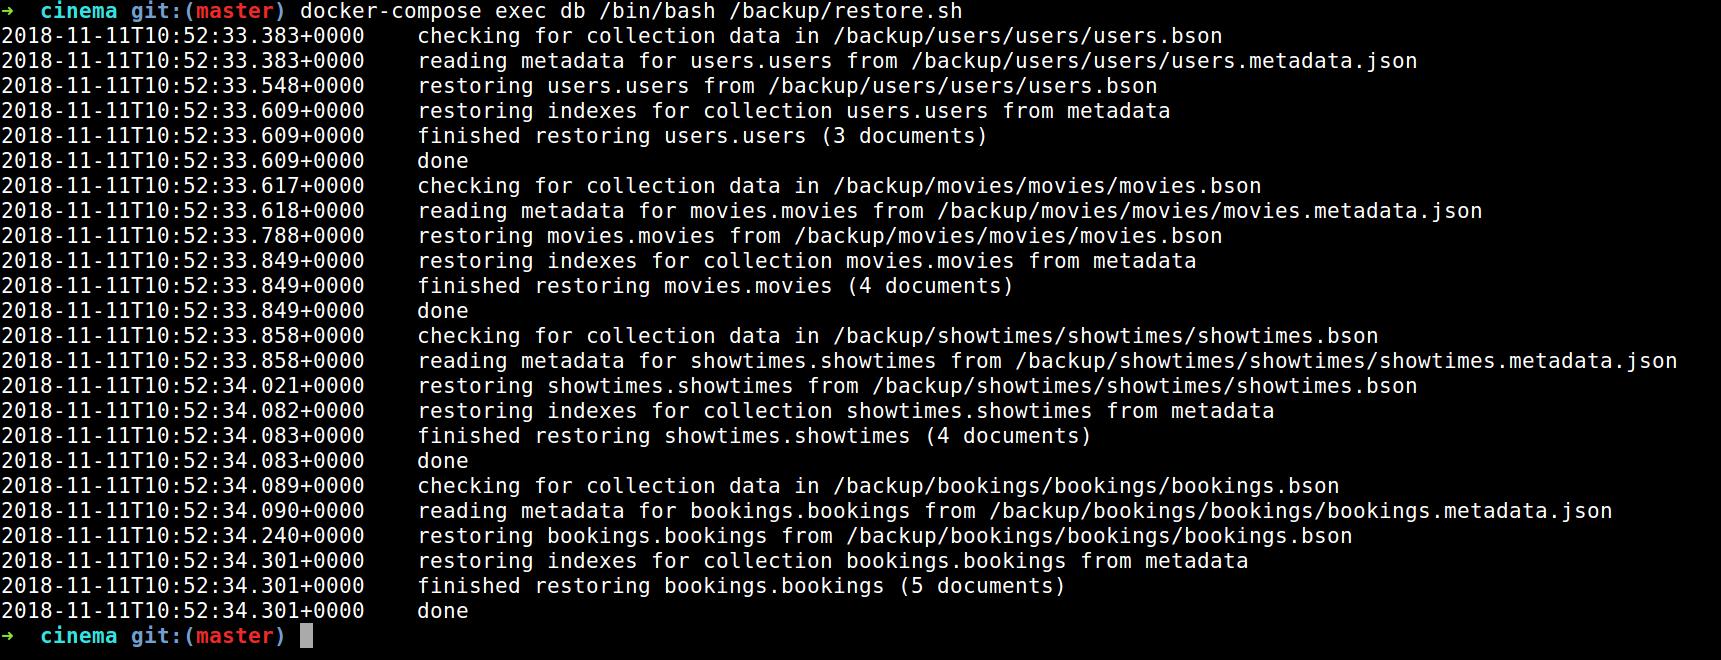 microservices - restoring database information